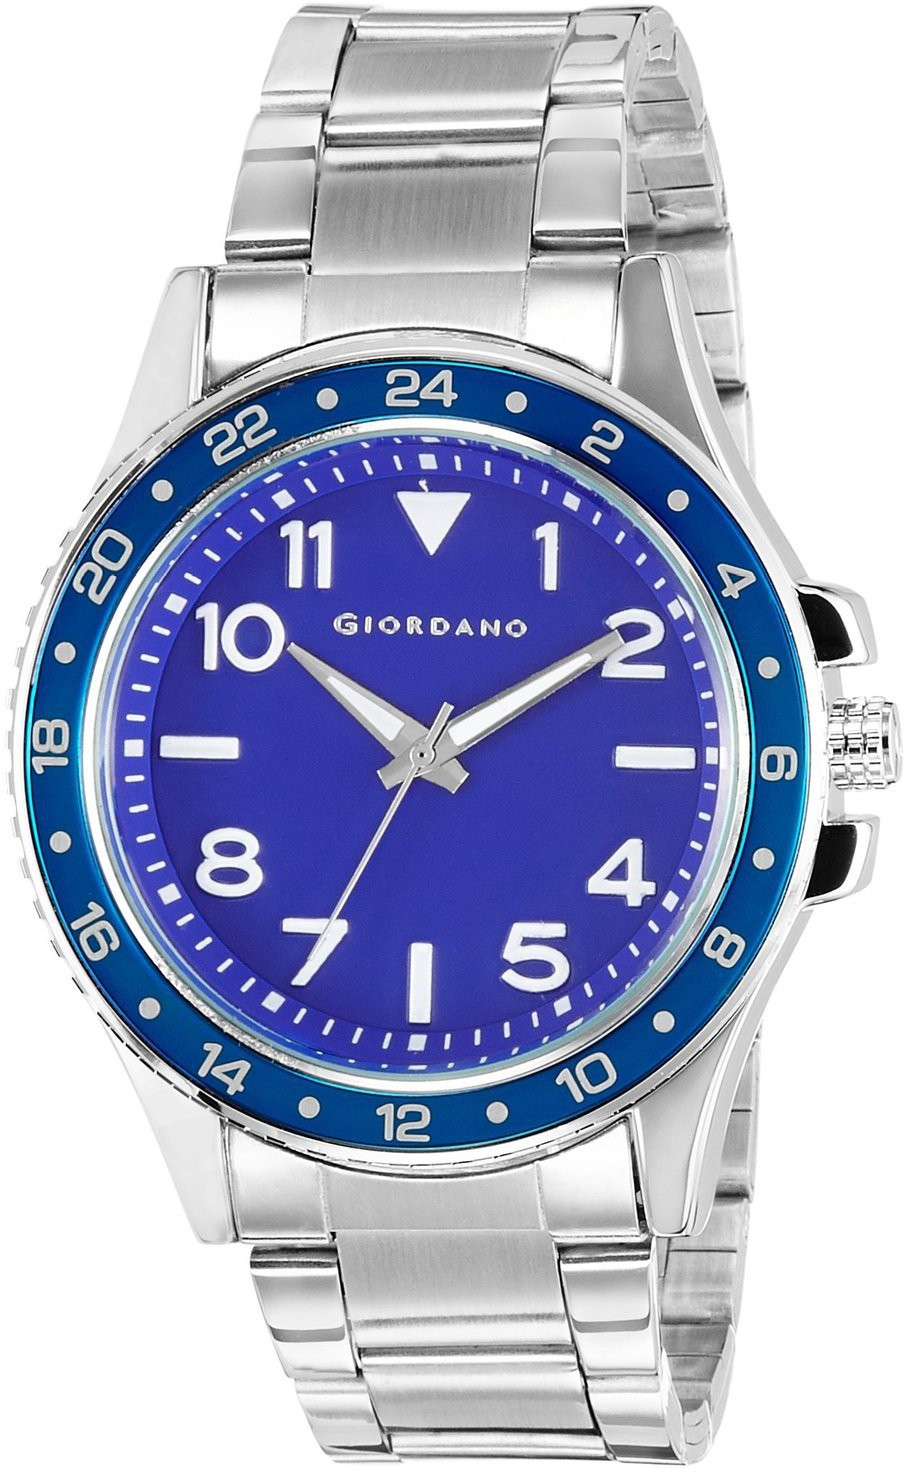 Deals - Delhi - Titan, Casio... <br> Watches<br> Category - watches<br> Business - Flipkart.com